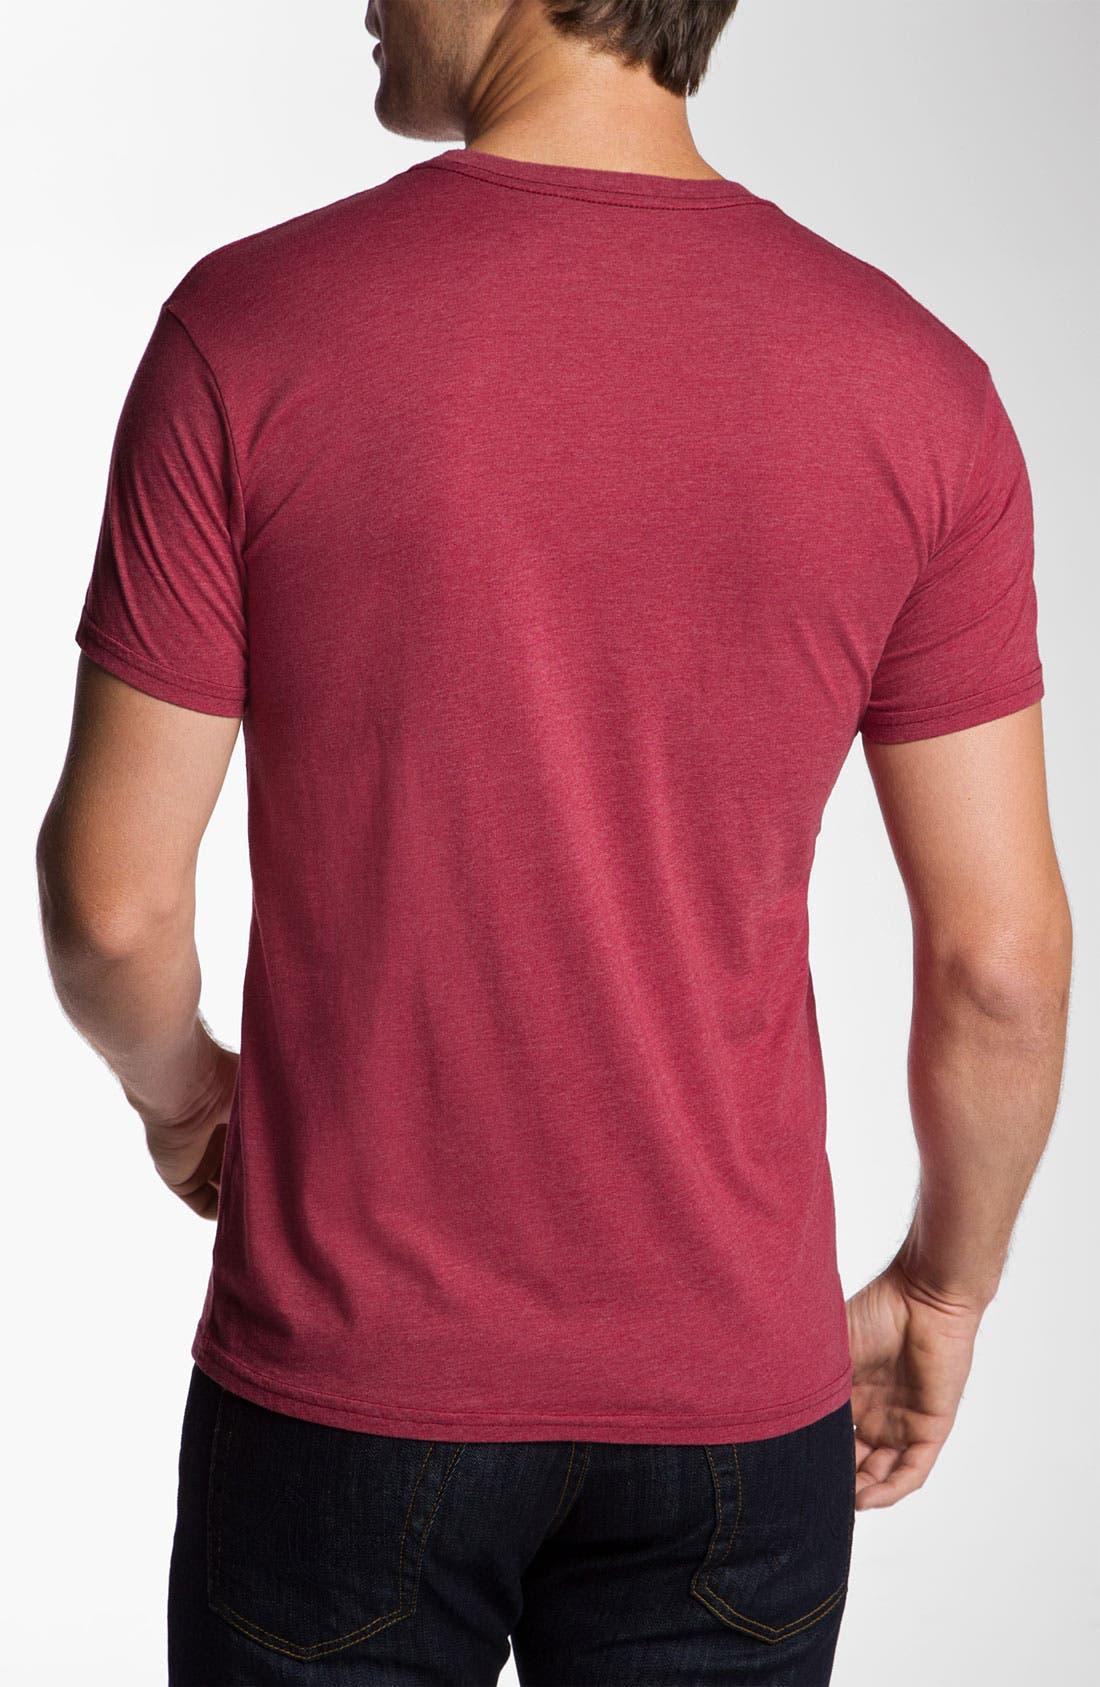 Alternate Image 2  - The Original Retro Brand 'Maryland Terrapins' T-Shirt